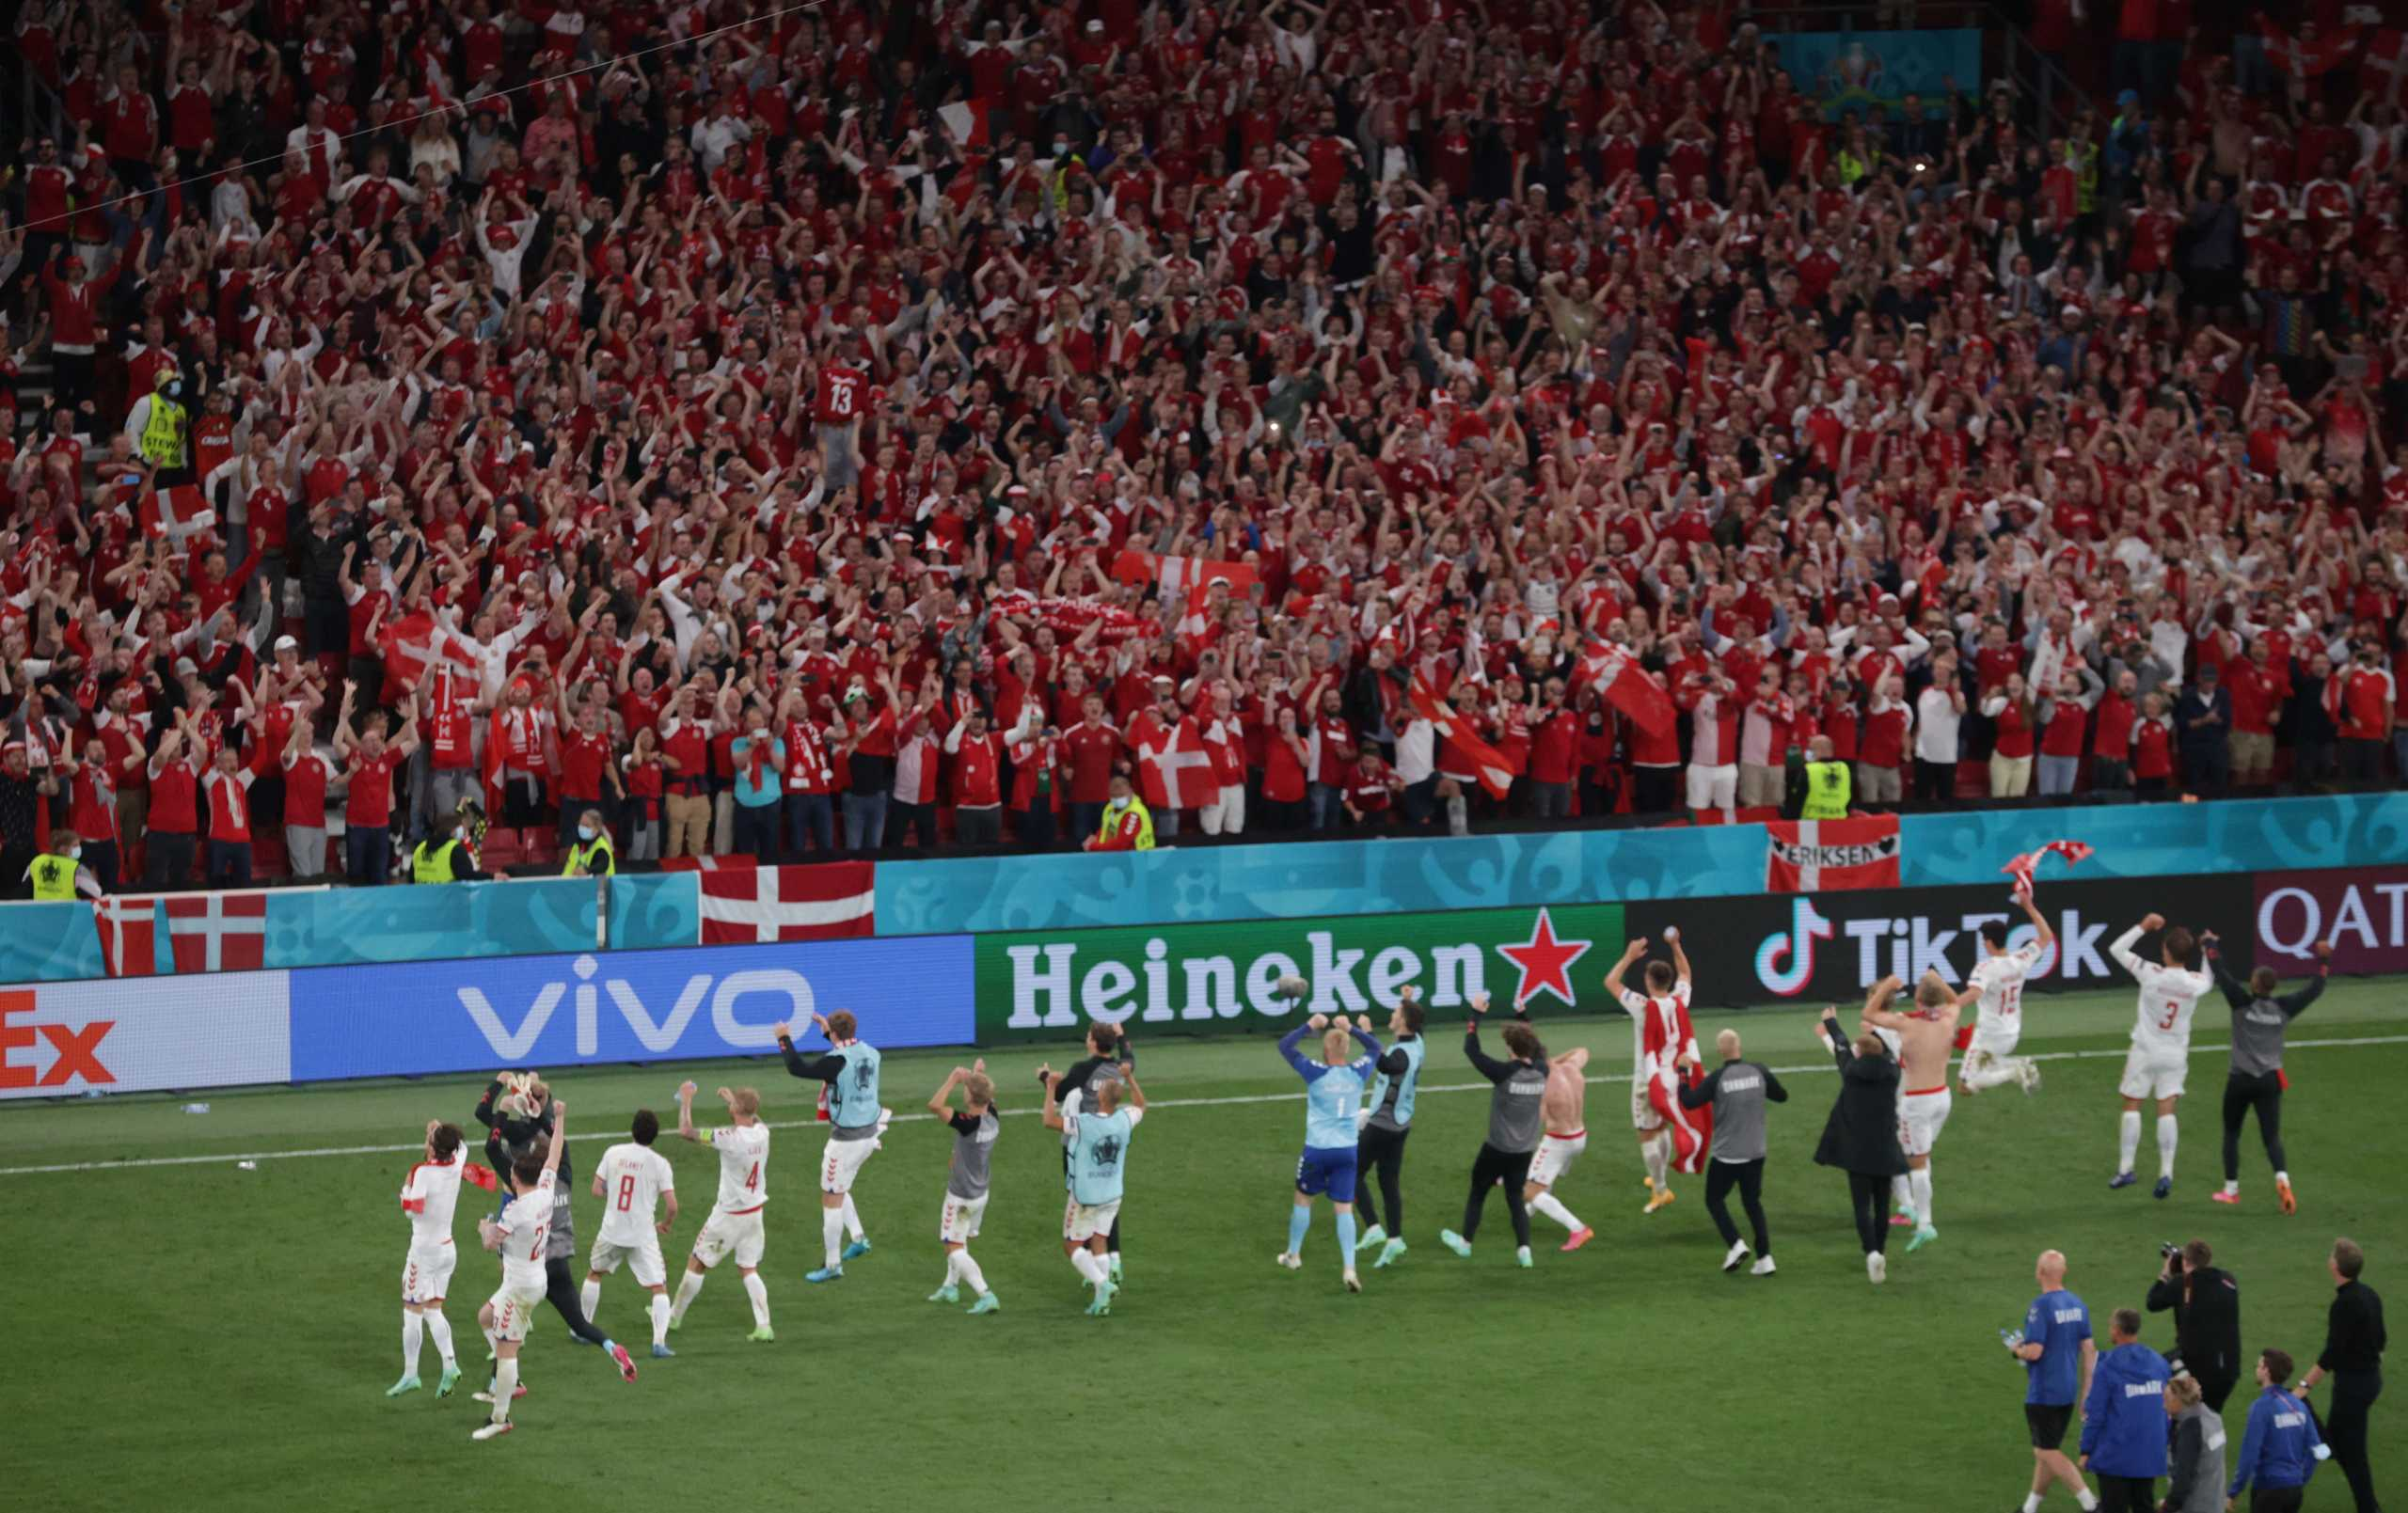 Euro 2020: Ταξίδι-αστραπή Δανών φιλάθλων στην Ολλανδία για να γλιτώσουν την καραντίνα